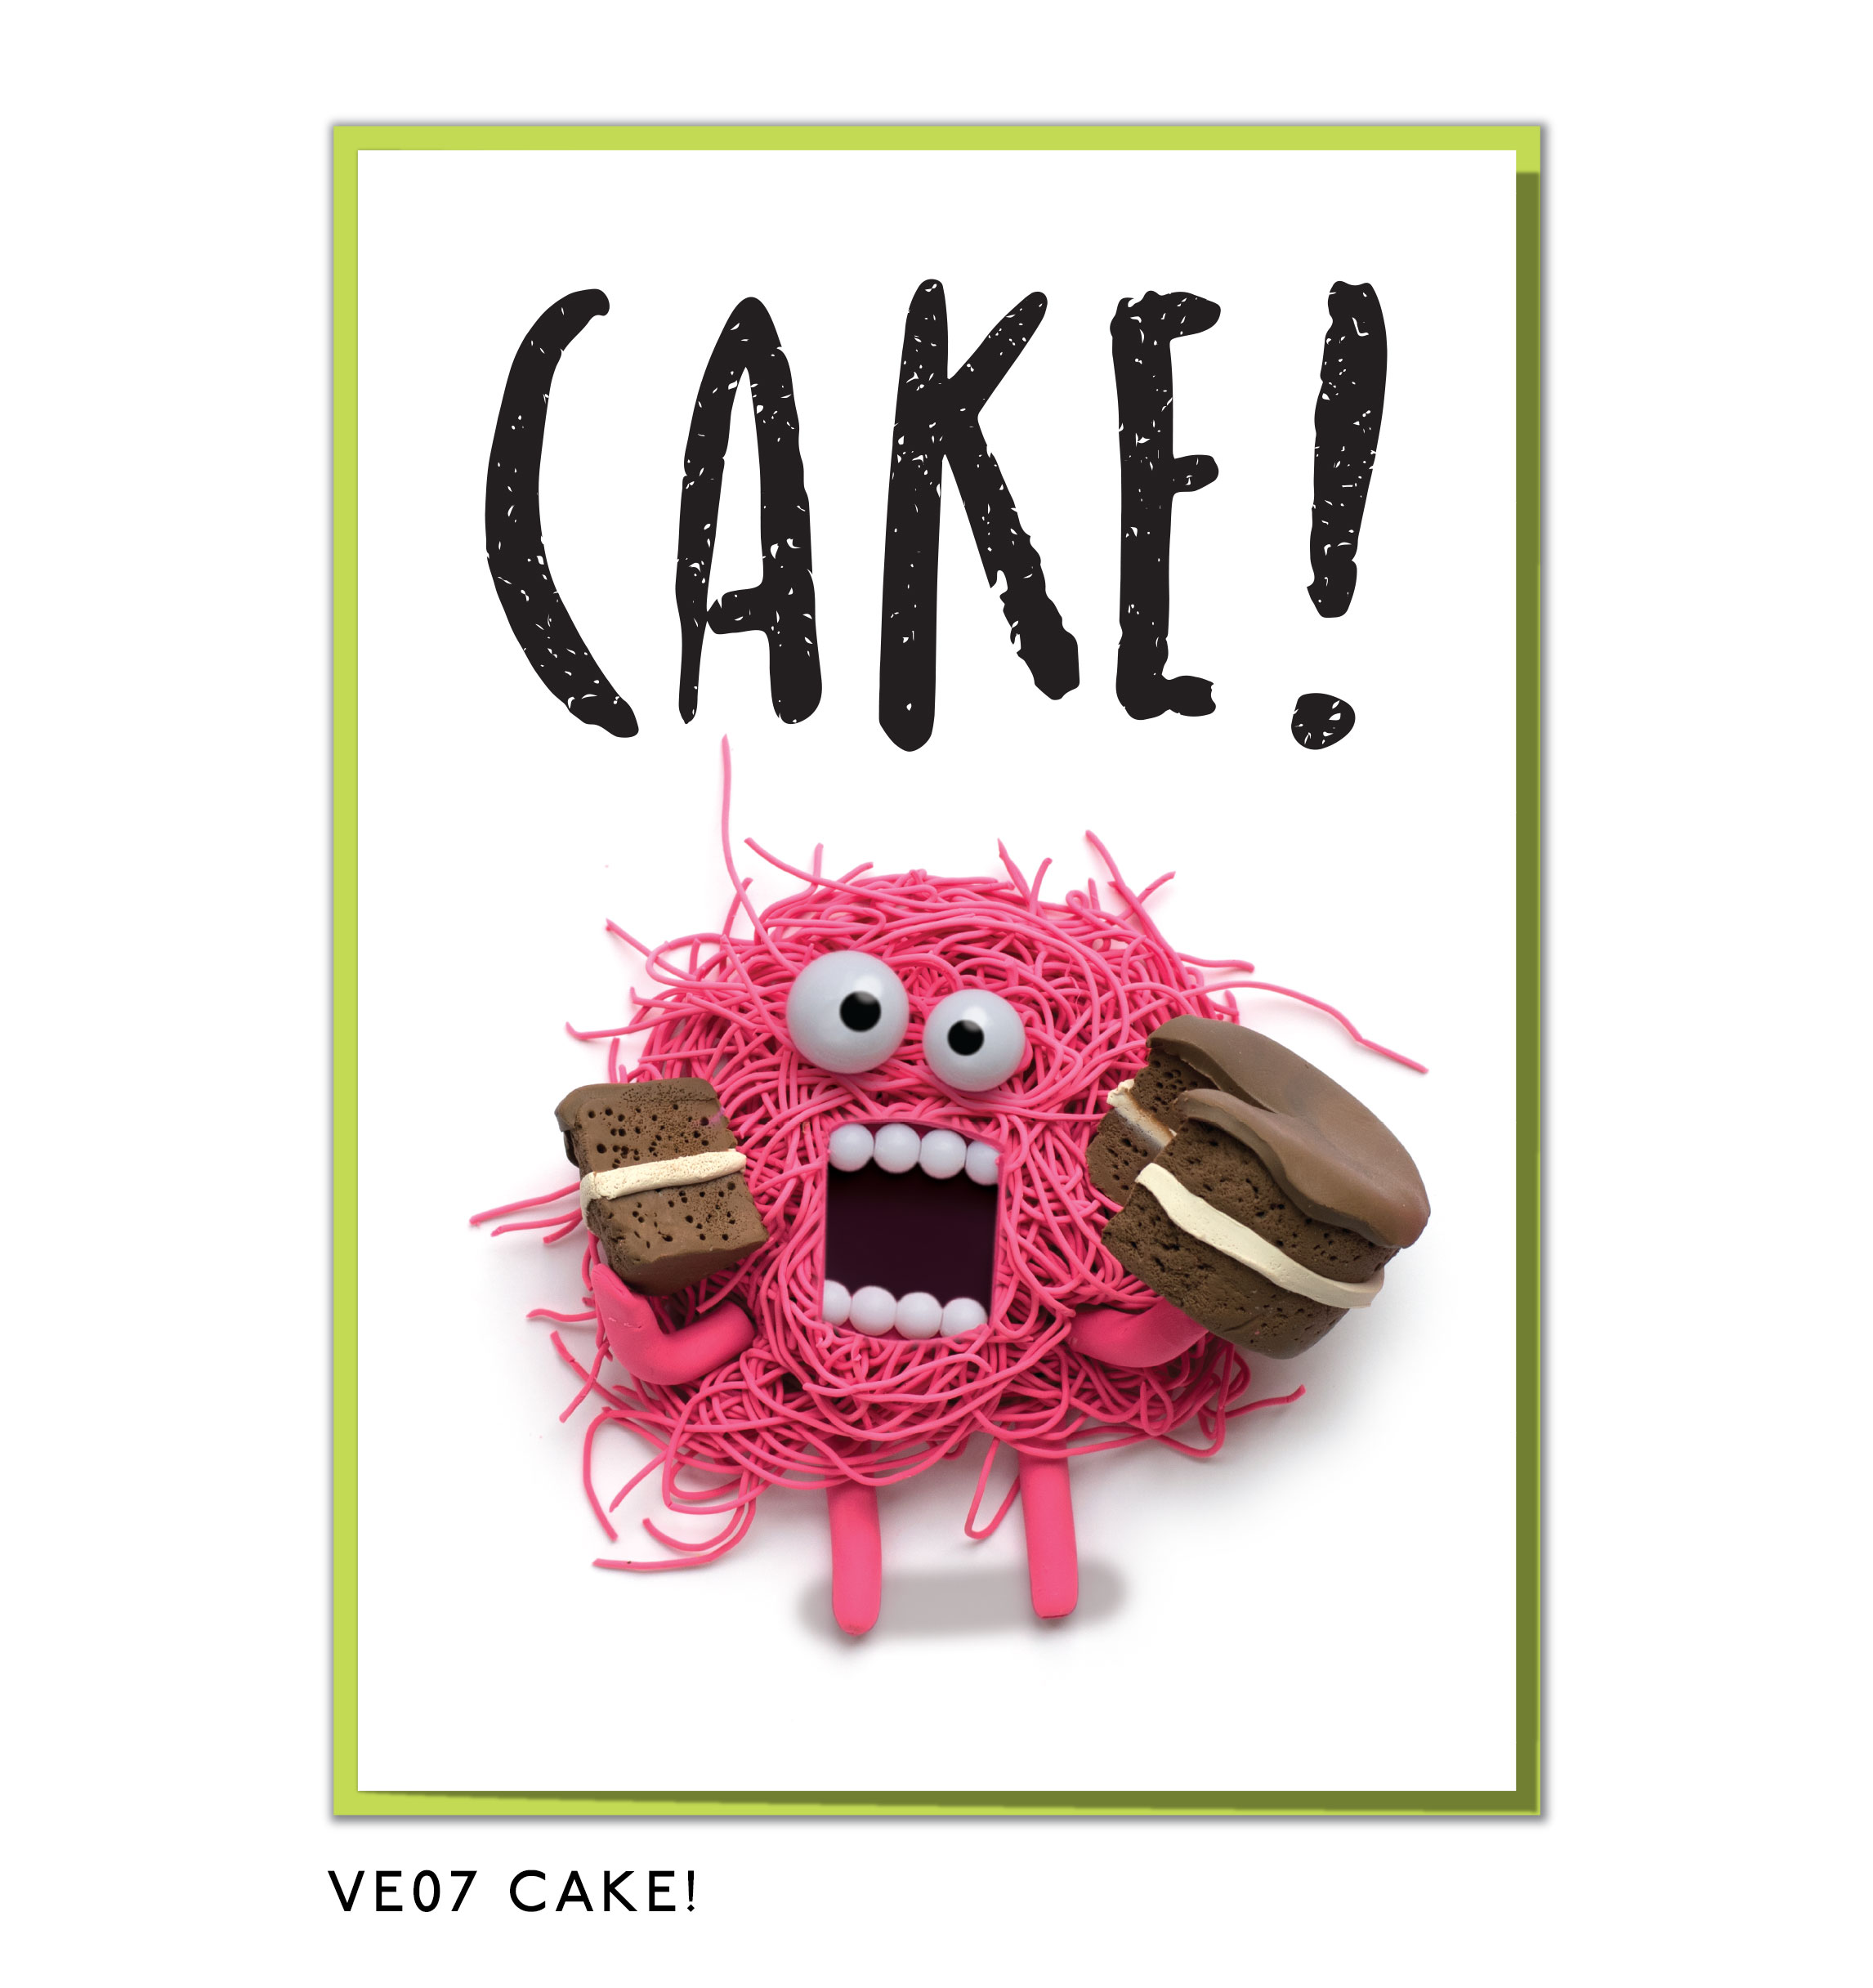 VE07-CAKE.jpg